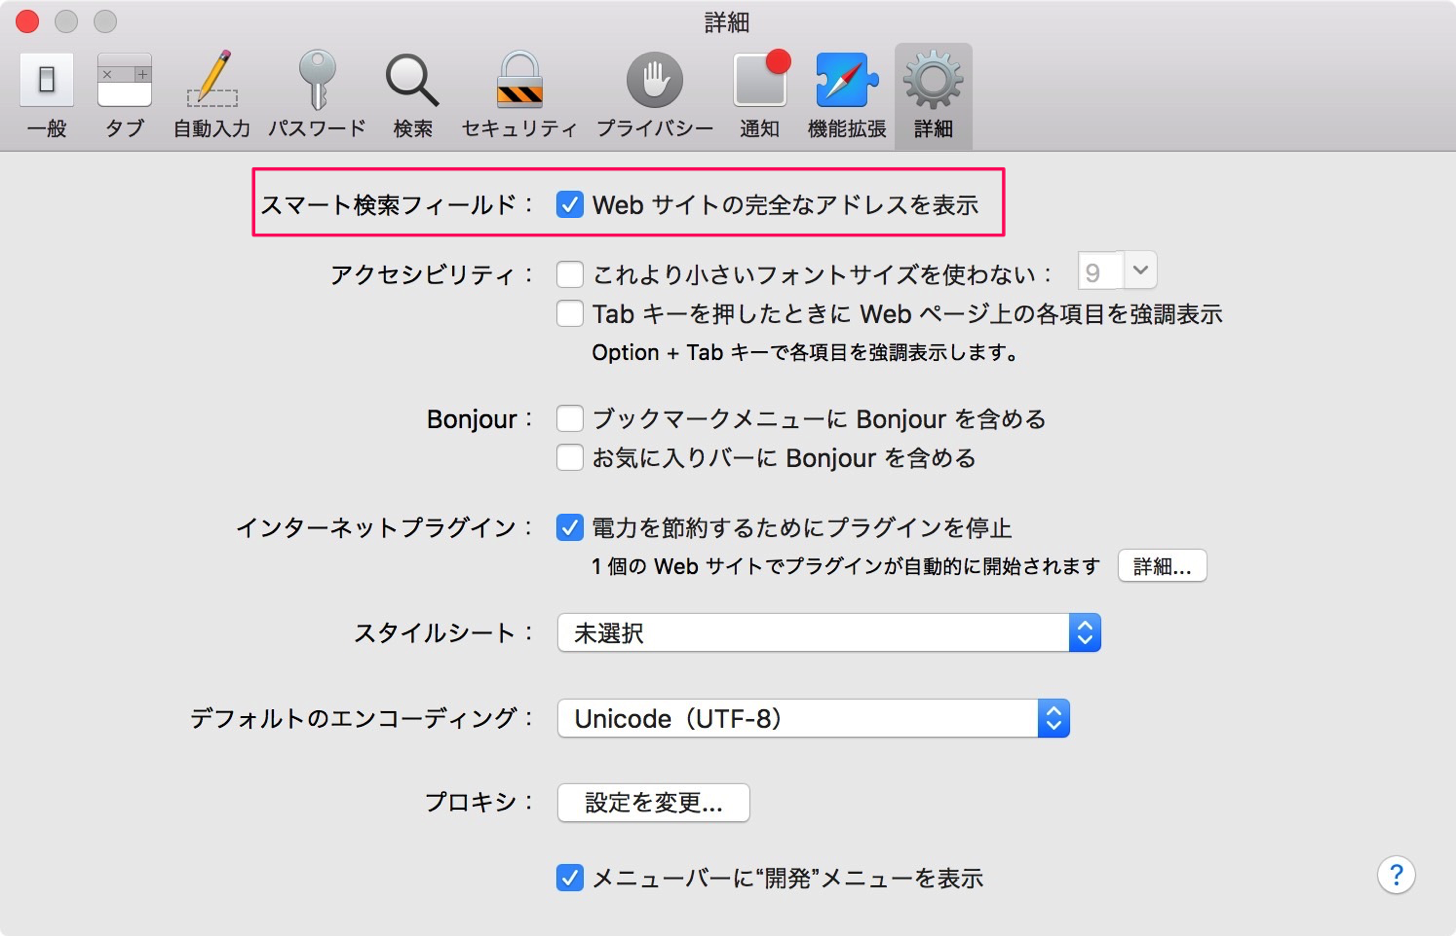 Safariスマート検索フィールドのWebサイトの完全なアドレスを表示